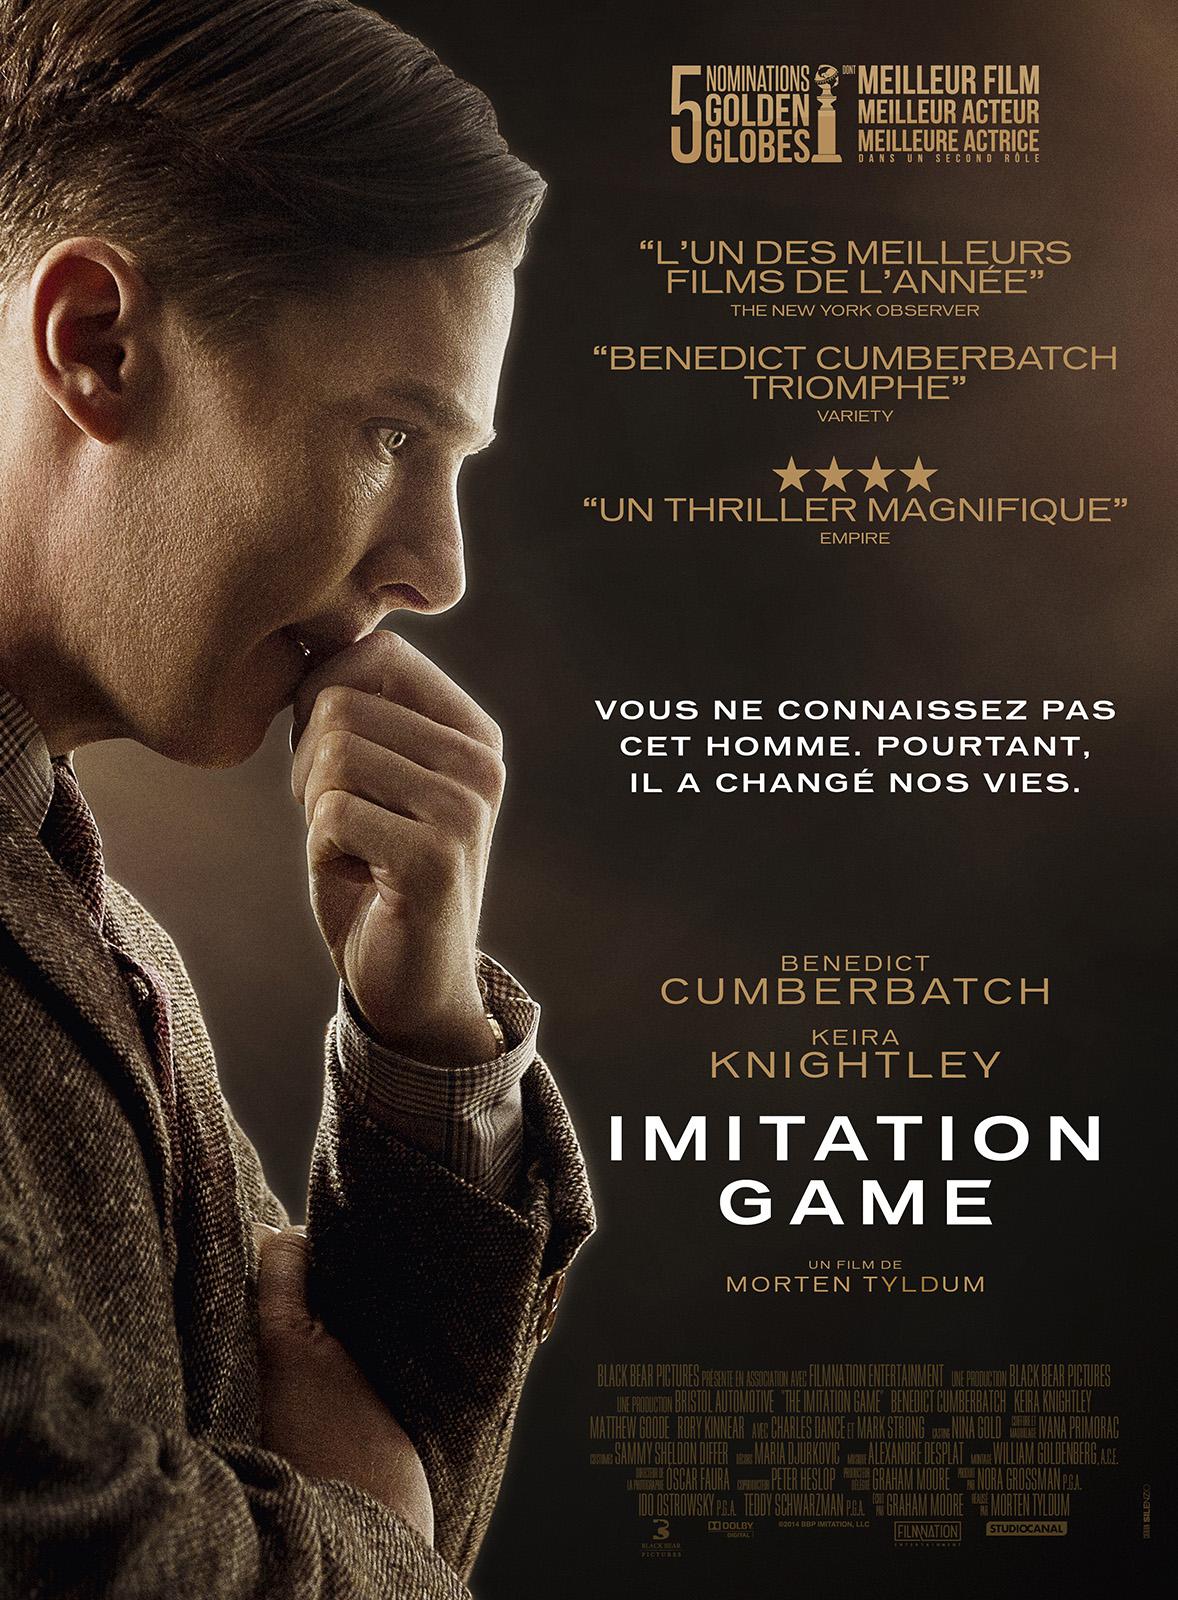 Imitation Game de Morten Tyldum